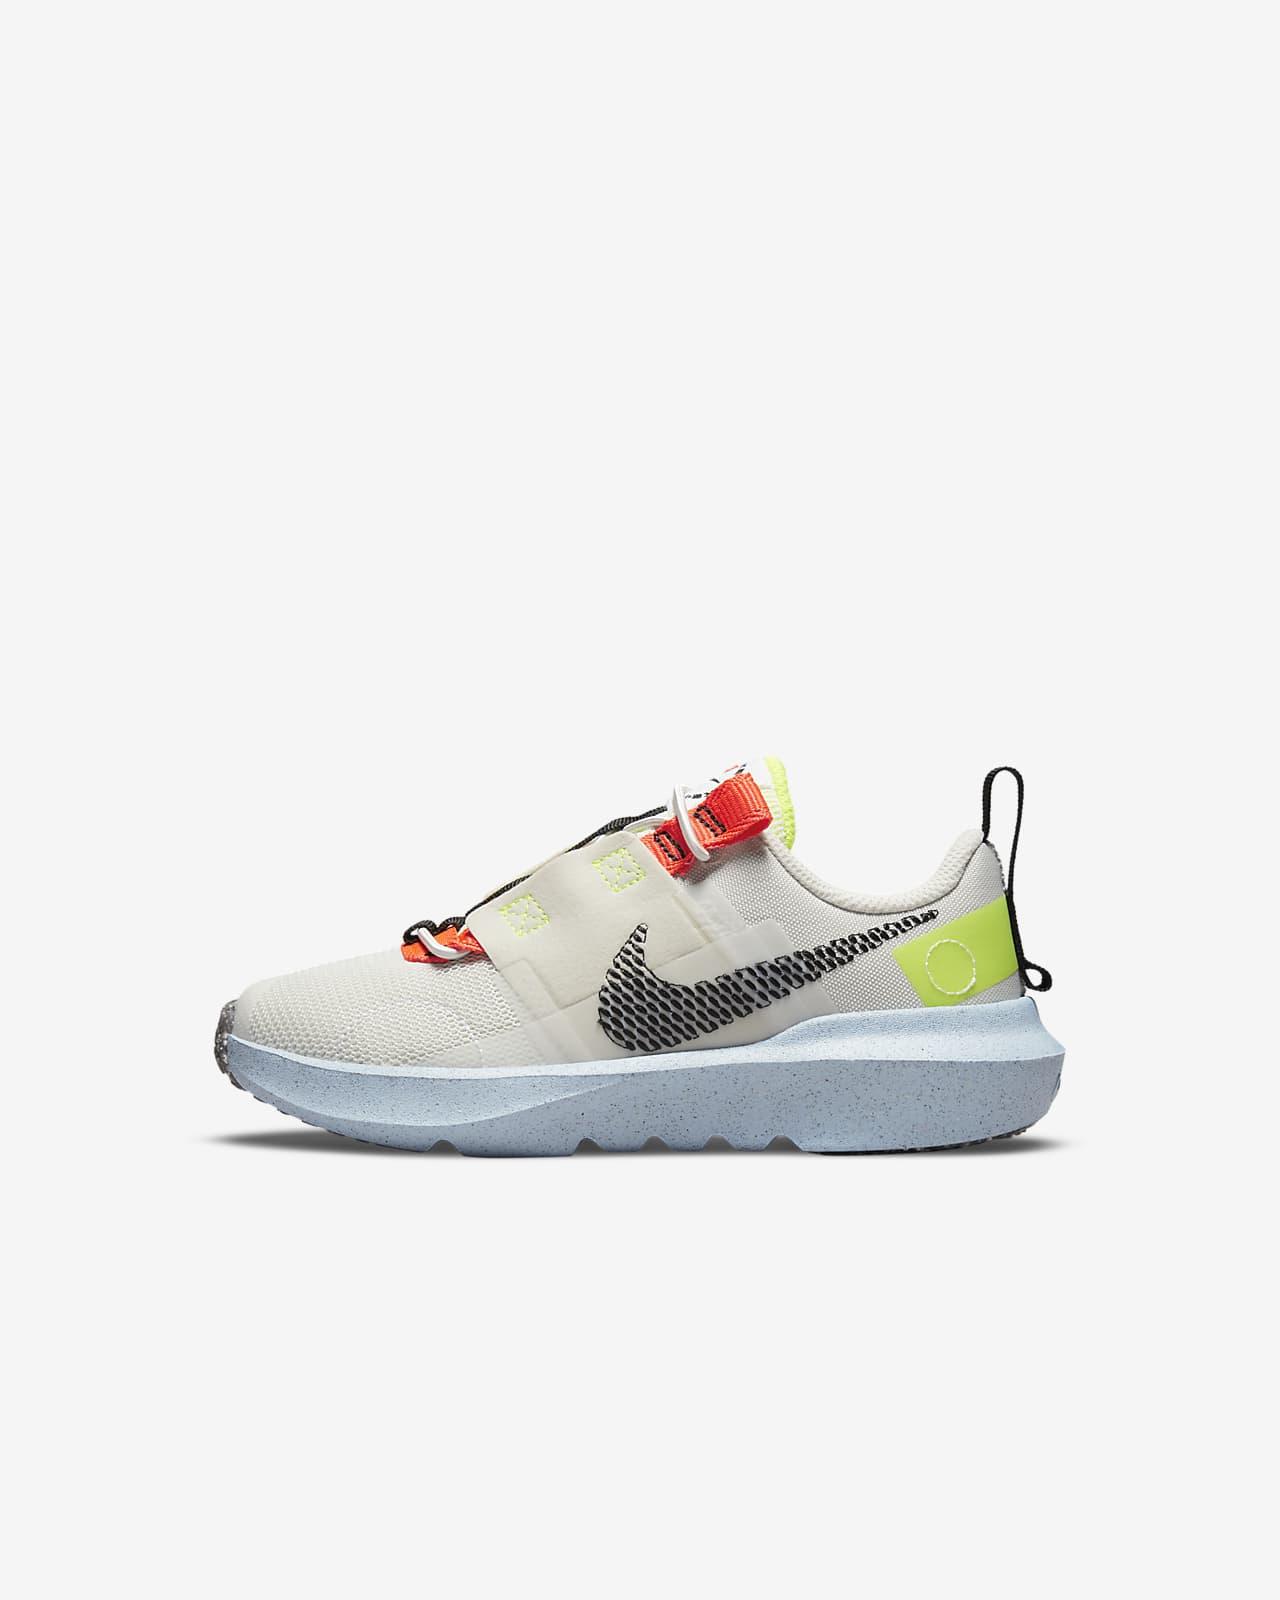 Chaussure Nike Crater Impact pour Jeune enfant. Nike LU